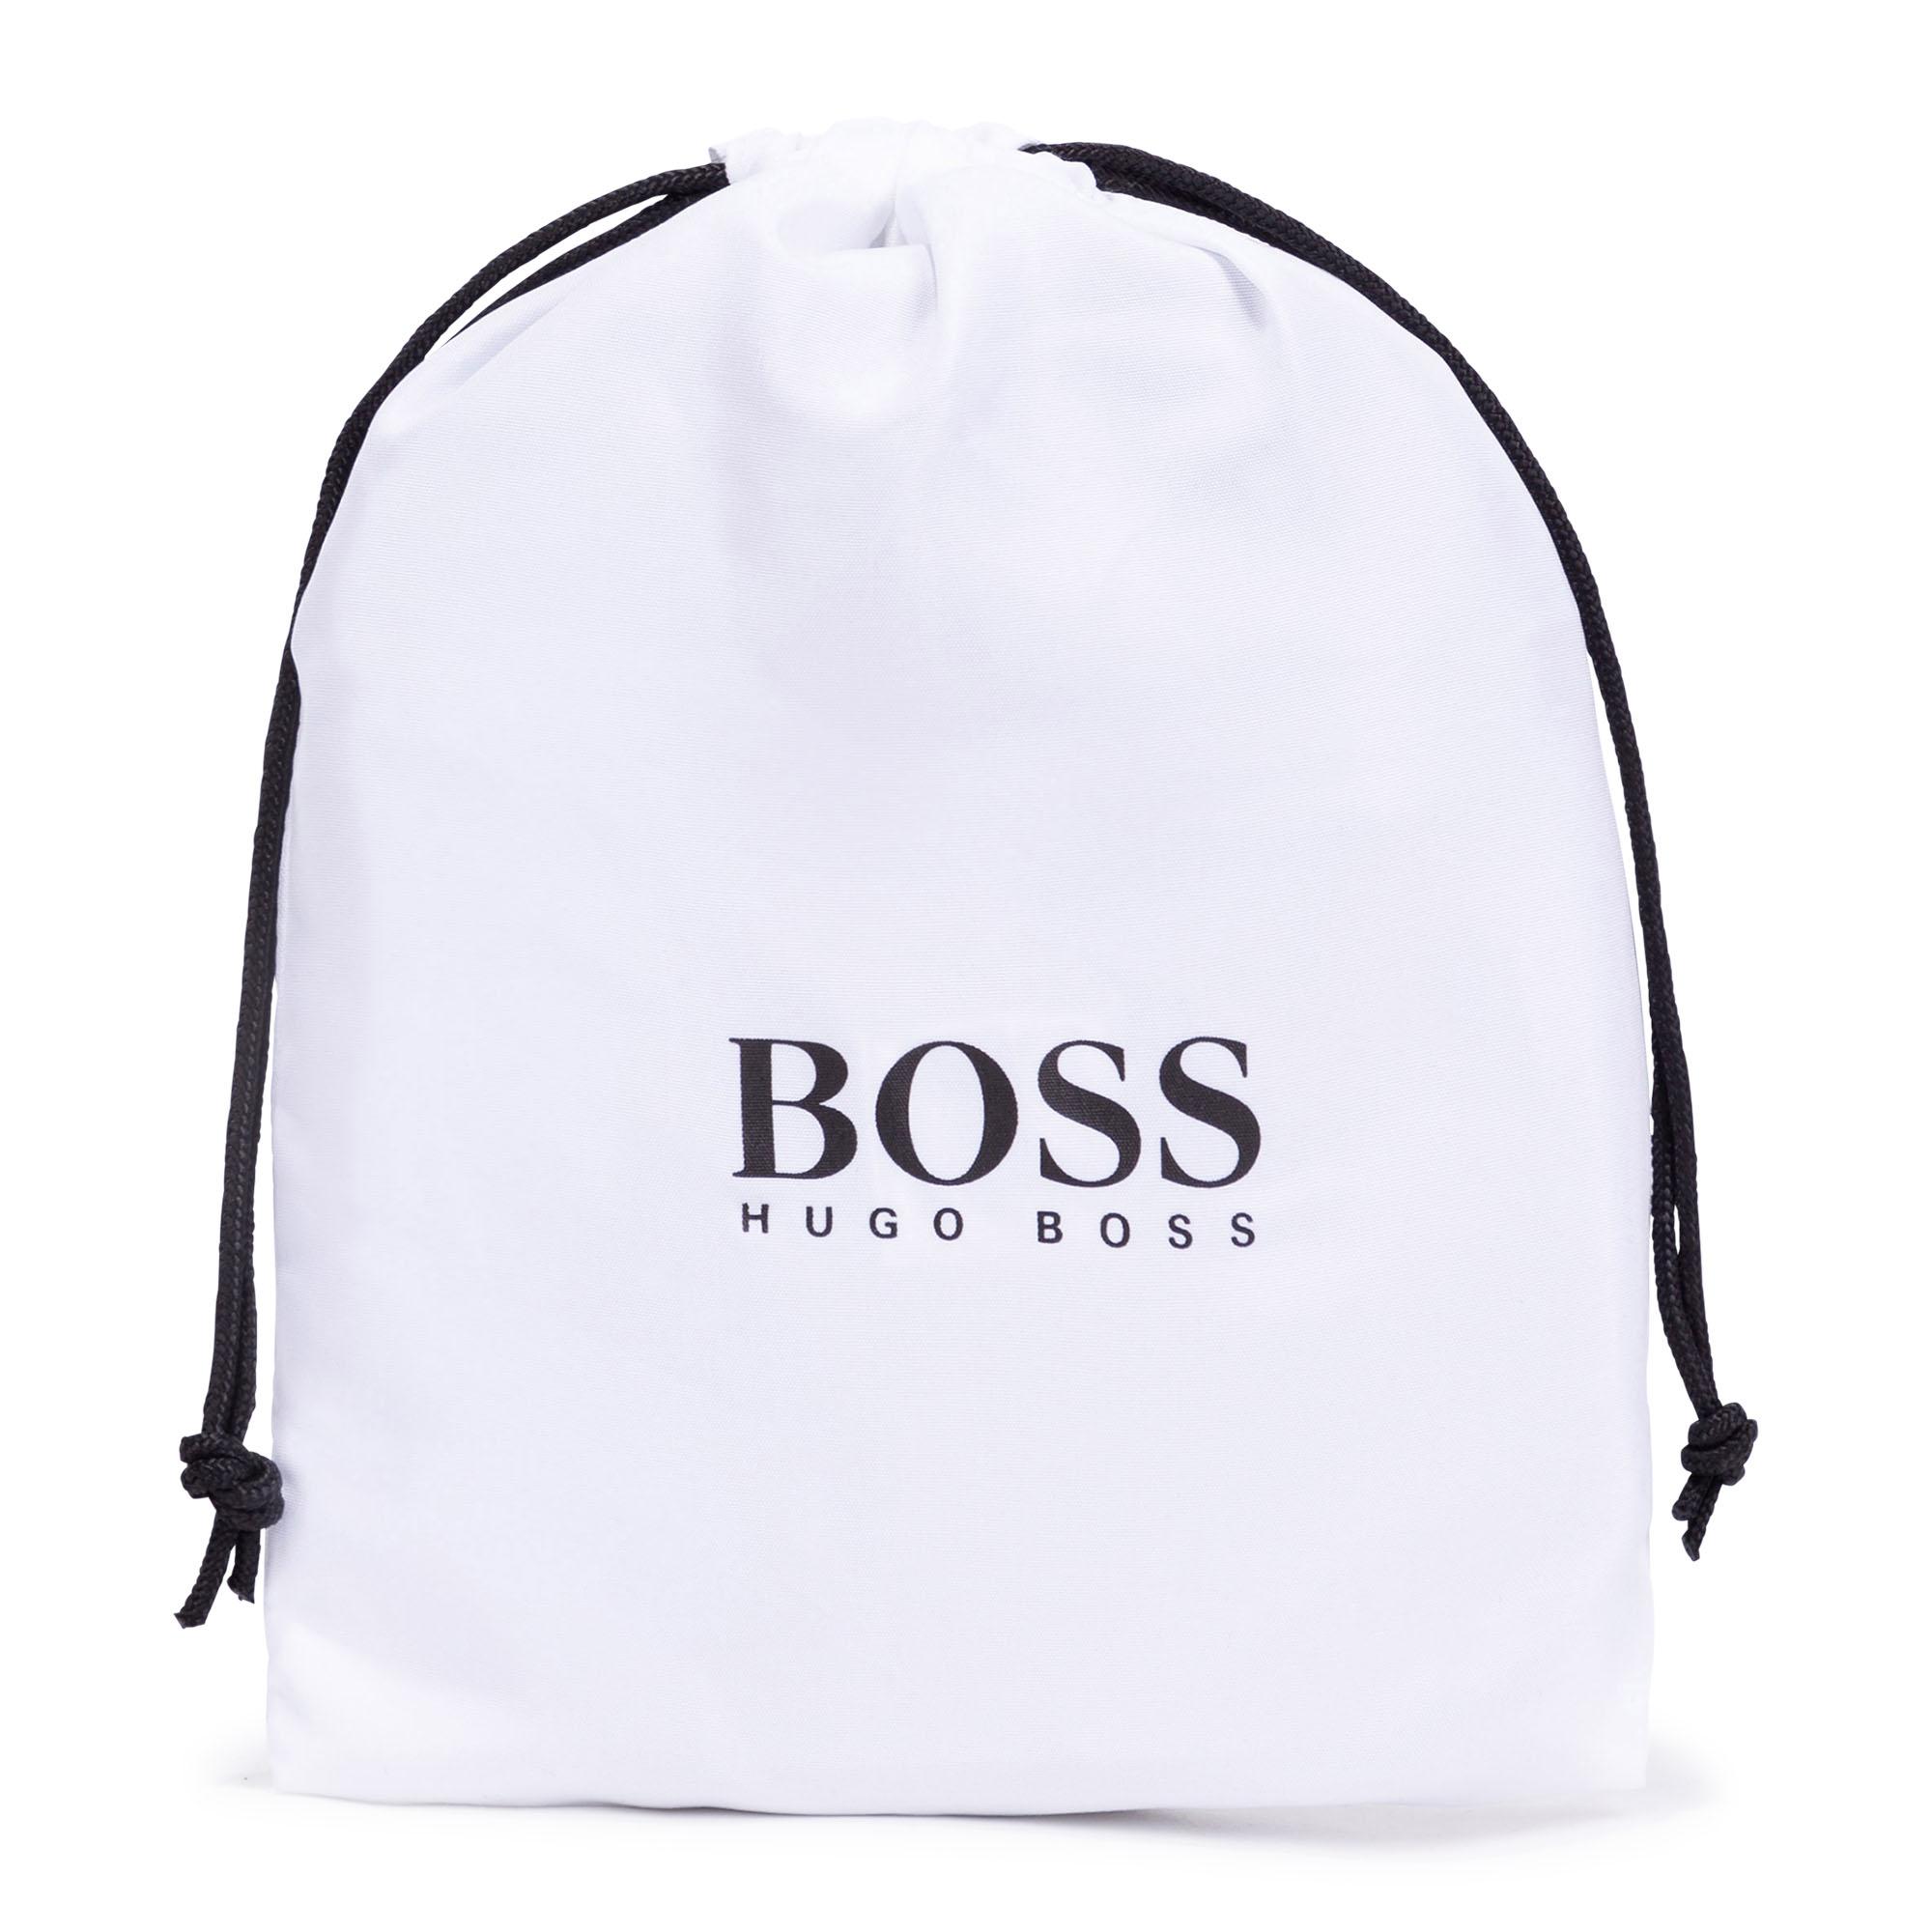 Zipped cross-body bag BOSS for BOY